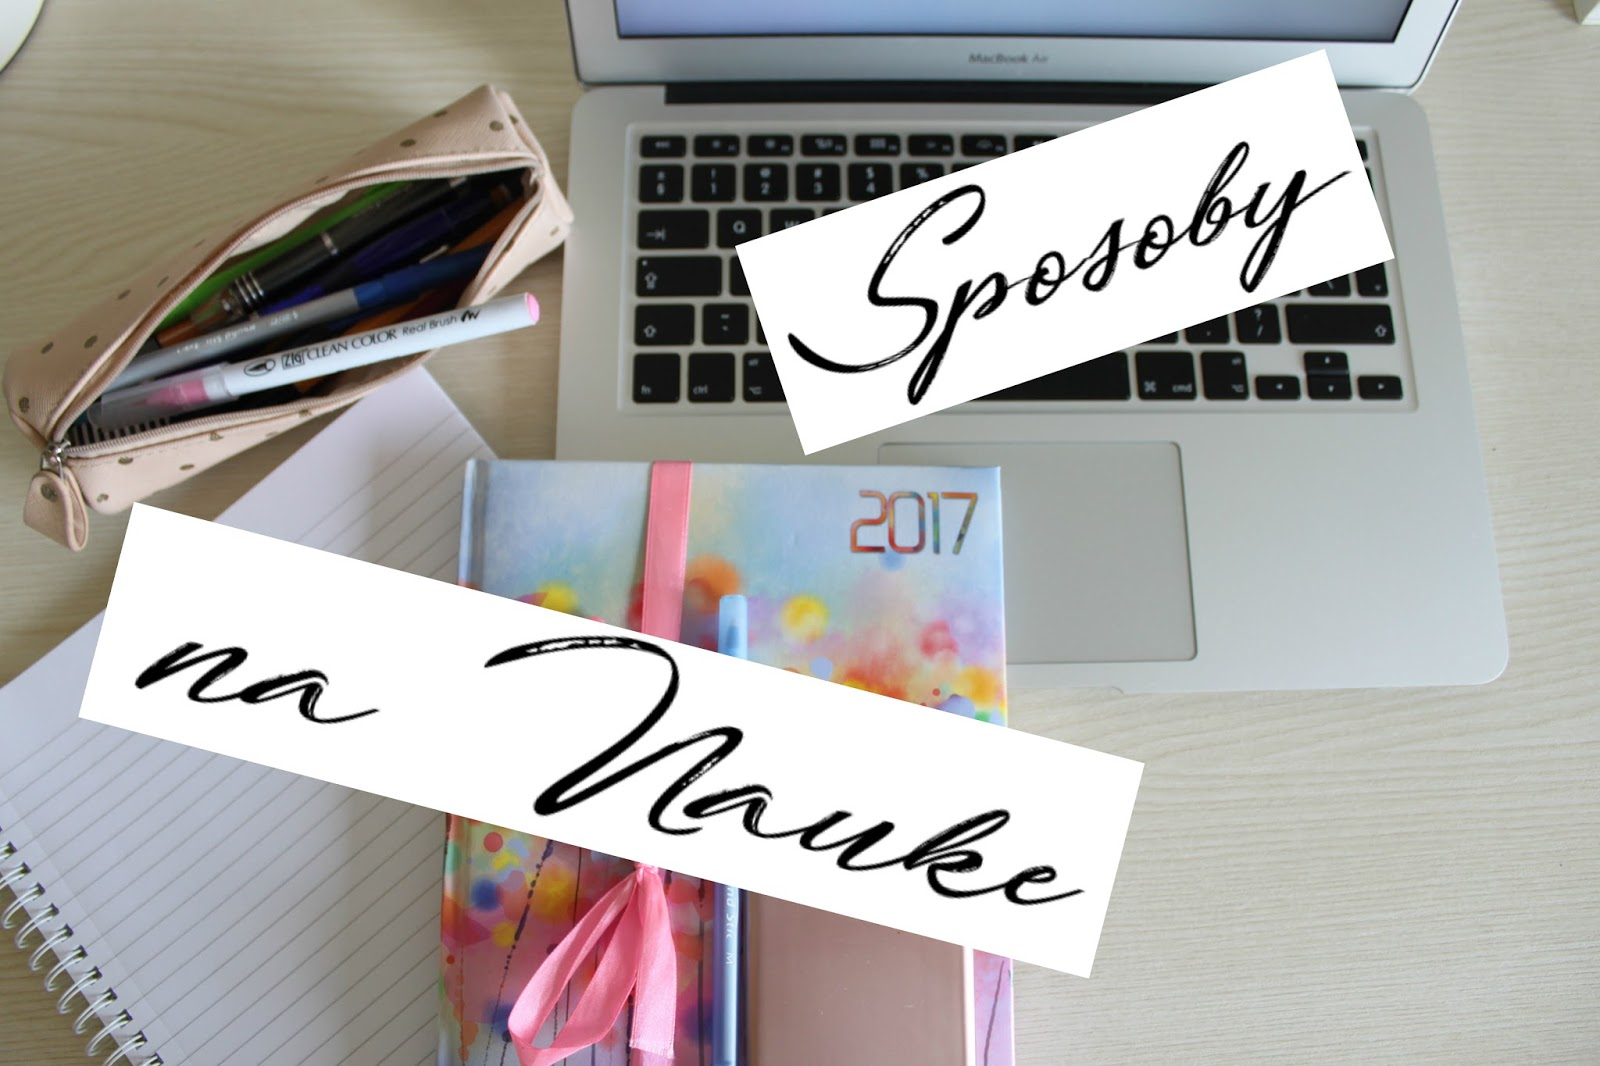 #25 BACK TO SCHOOL: SPOSOBY NA NAUKE  - tinypurpose